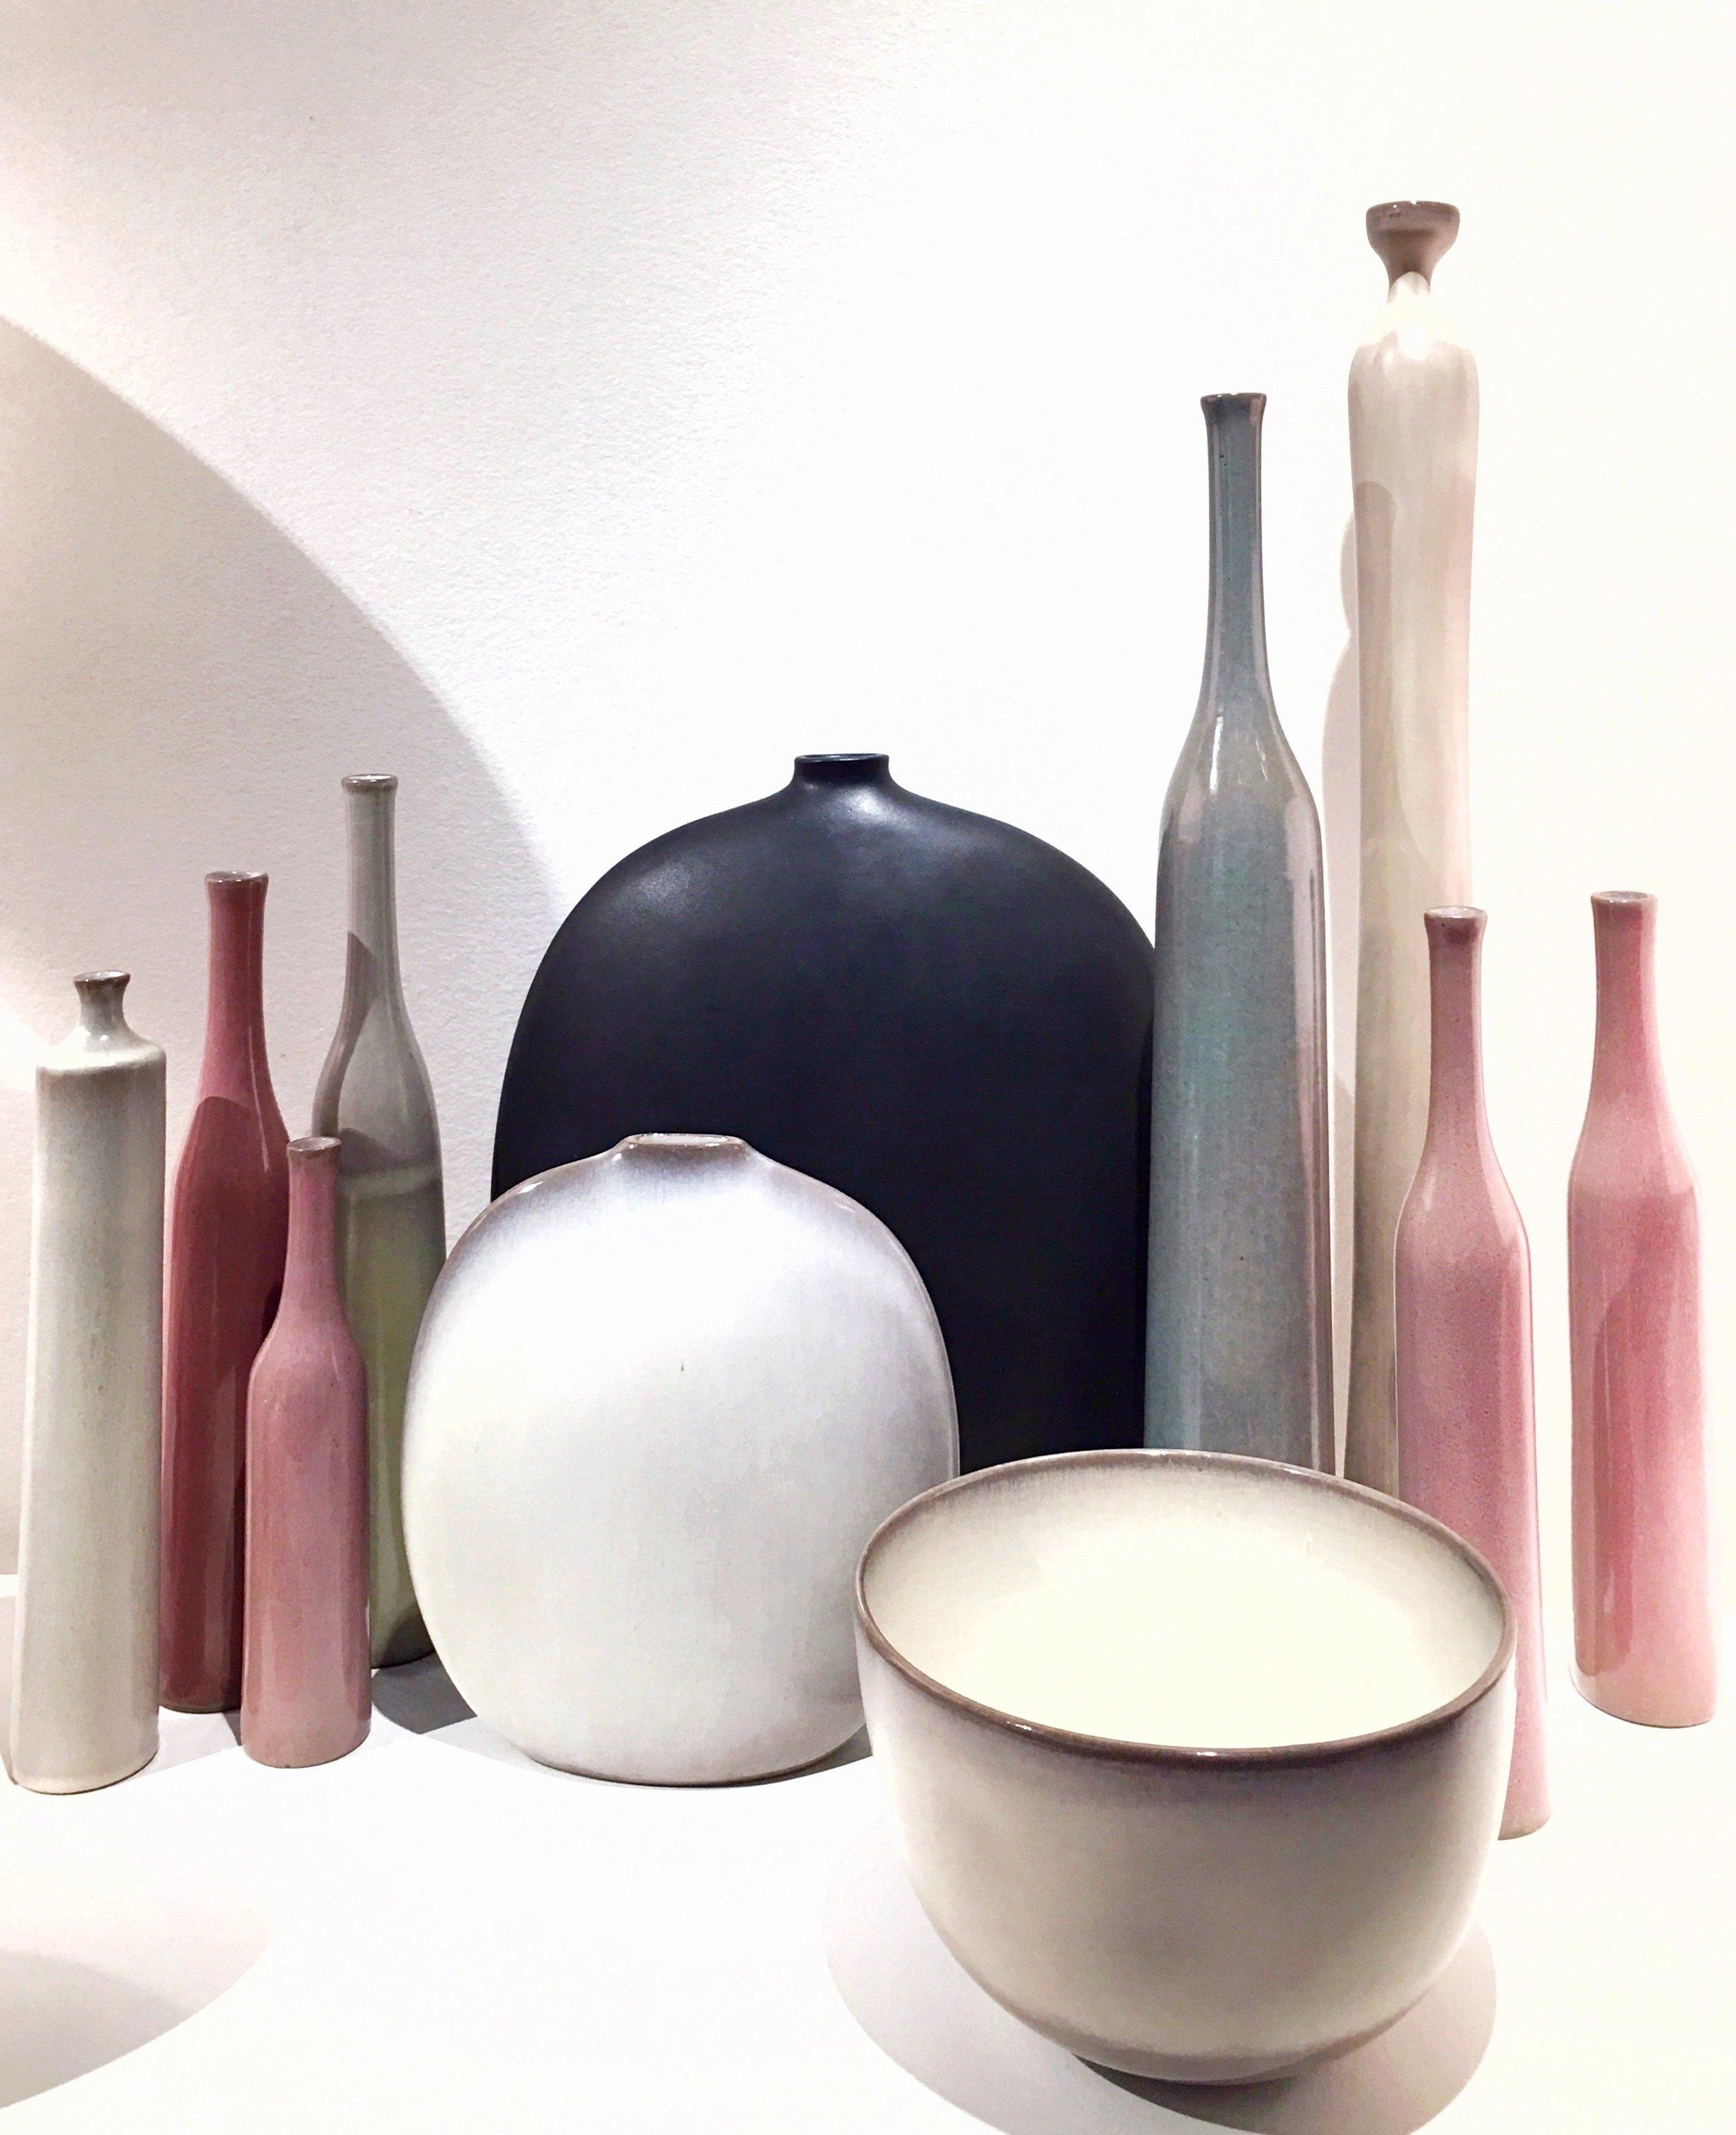 Jacques and Dani Ruellard Ceramics